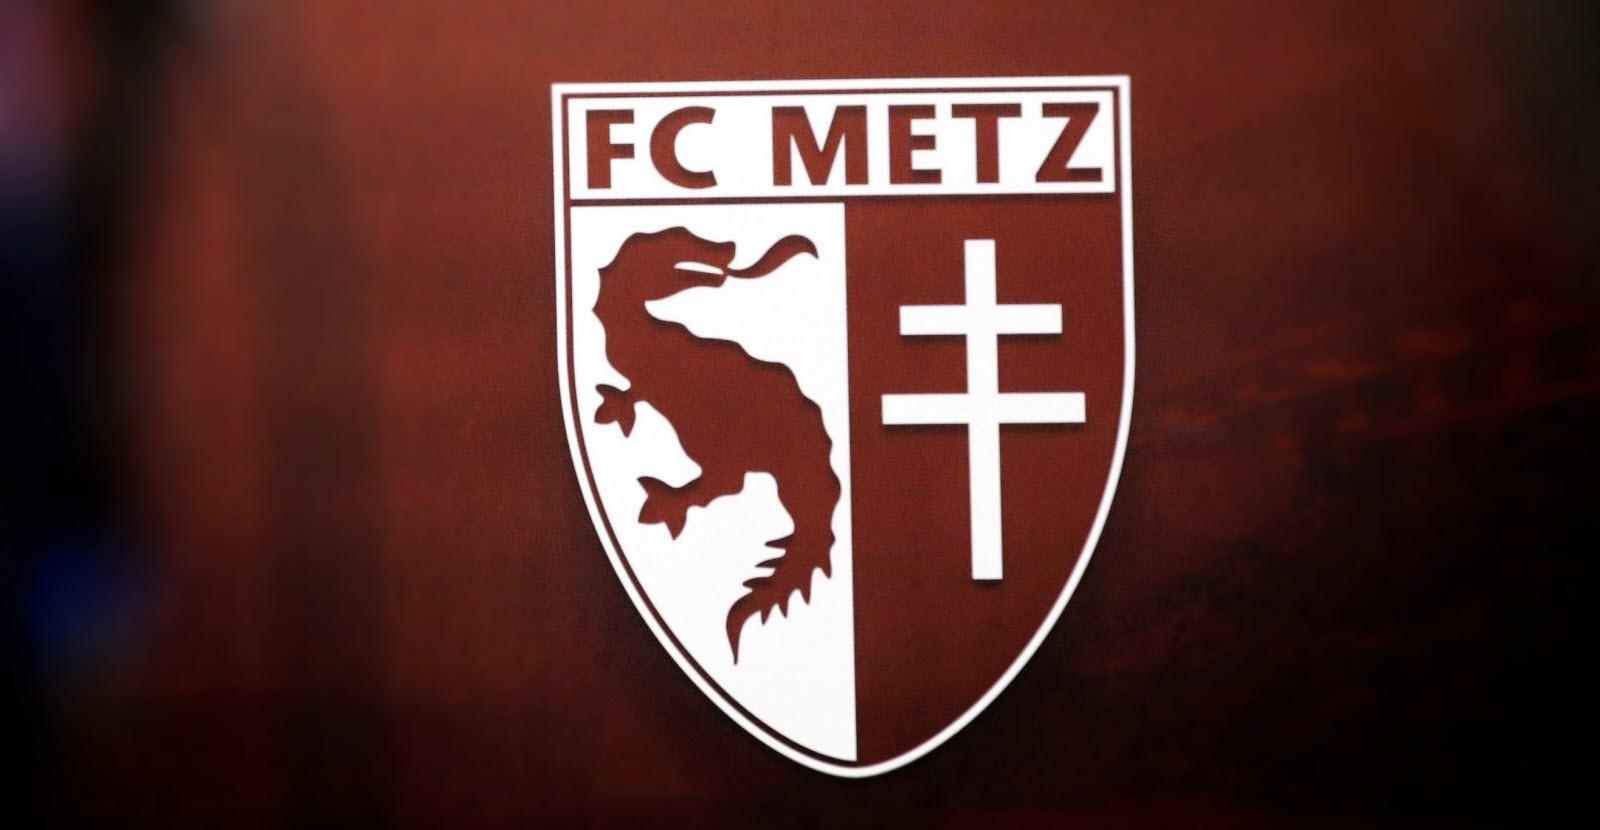 FC Metz - Mercato : Ambrose transféré chez les Grenats